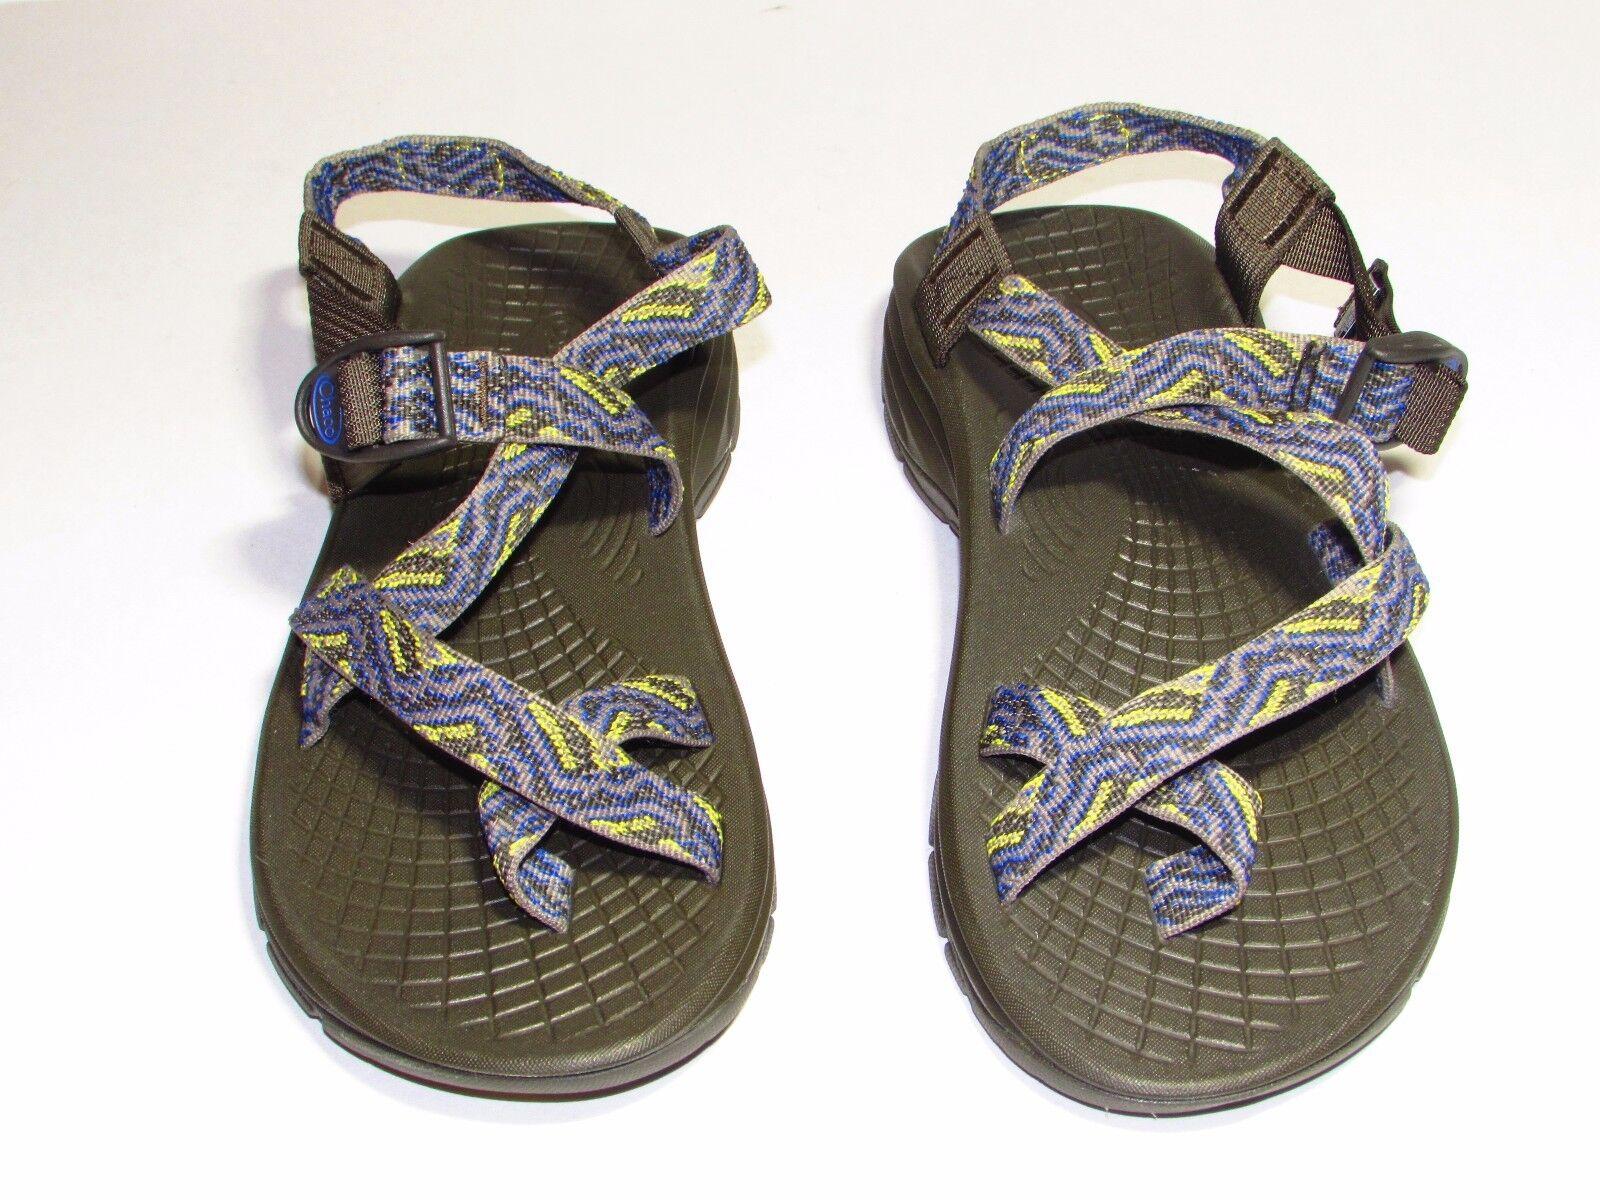 Chaco ZVOLV 2 Strap sandals  Men's Mandarin Brindle  Size Us 9 J105515